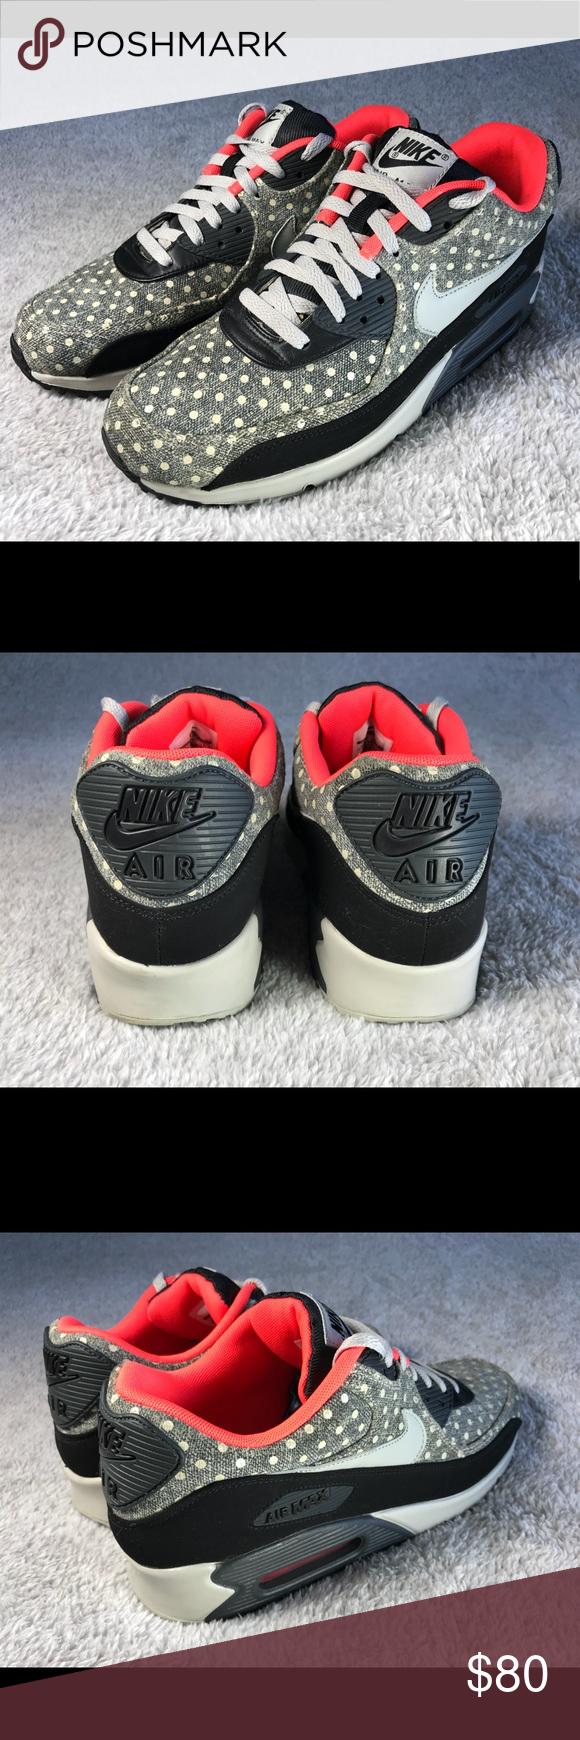 Nike Air Max 90 Leather Premium 'Polka Dot'